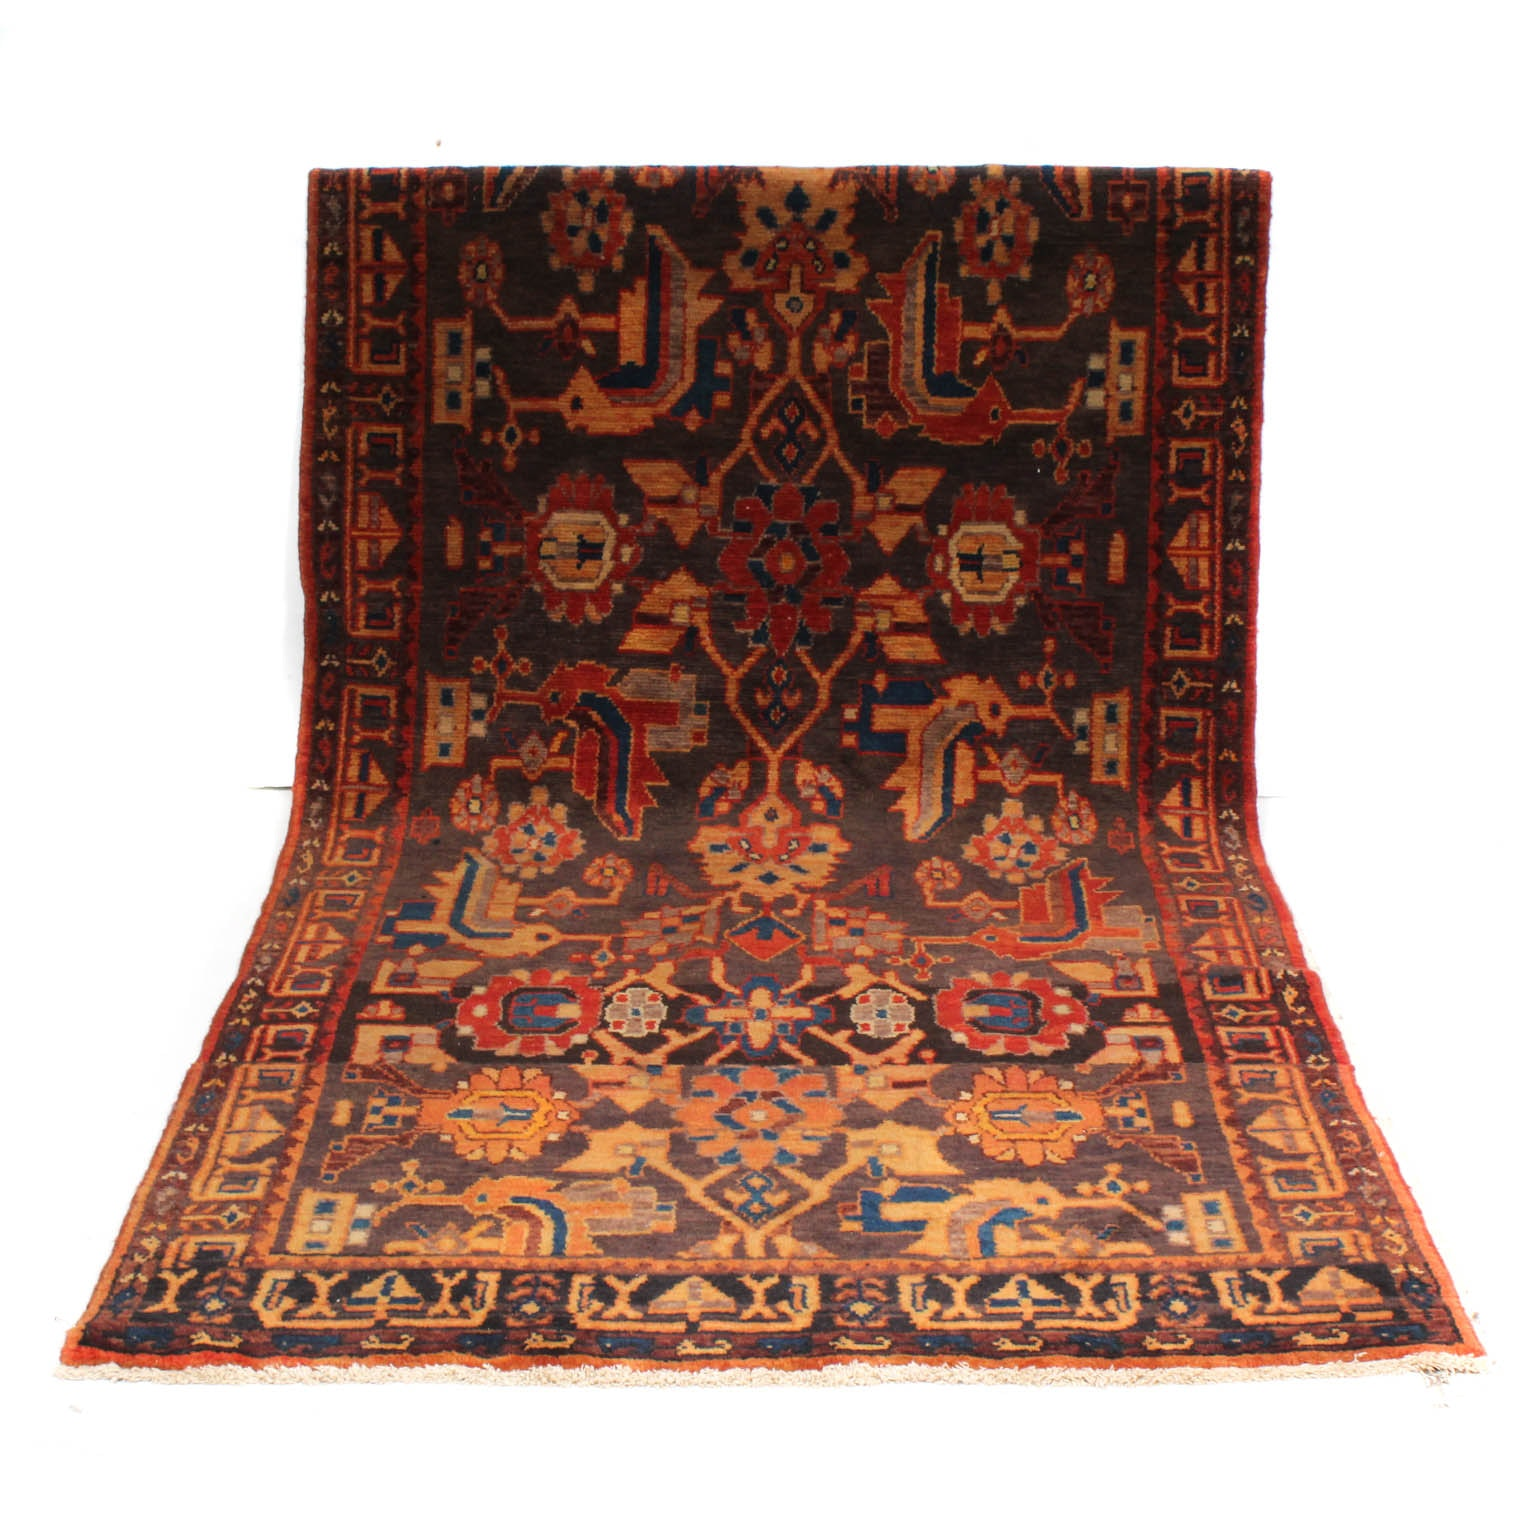 Vintage Hand-Knotted Pieced Persian Lilihan Sarouk Rug